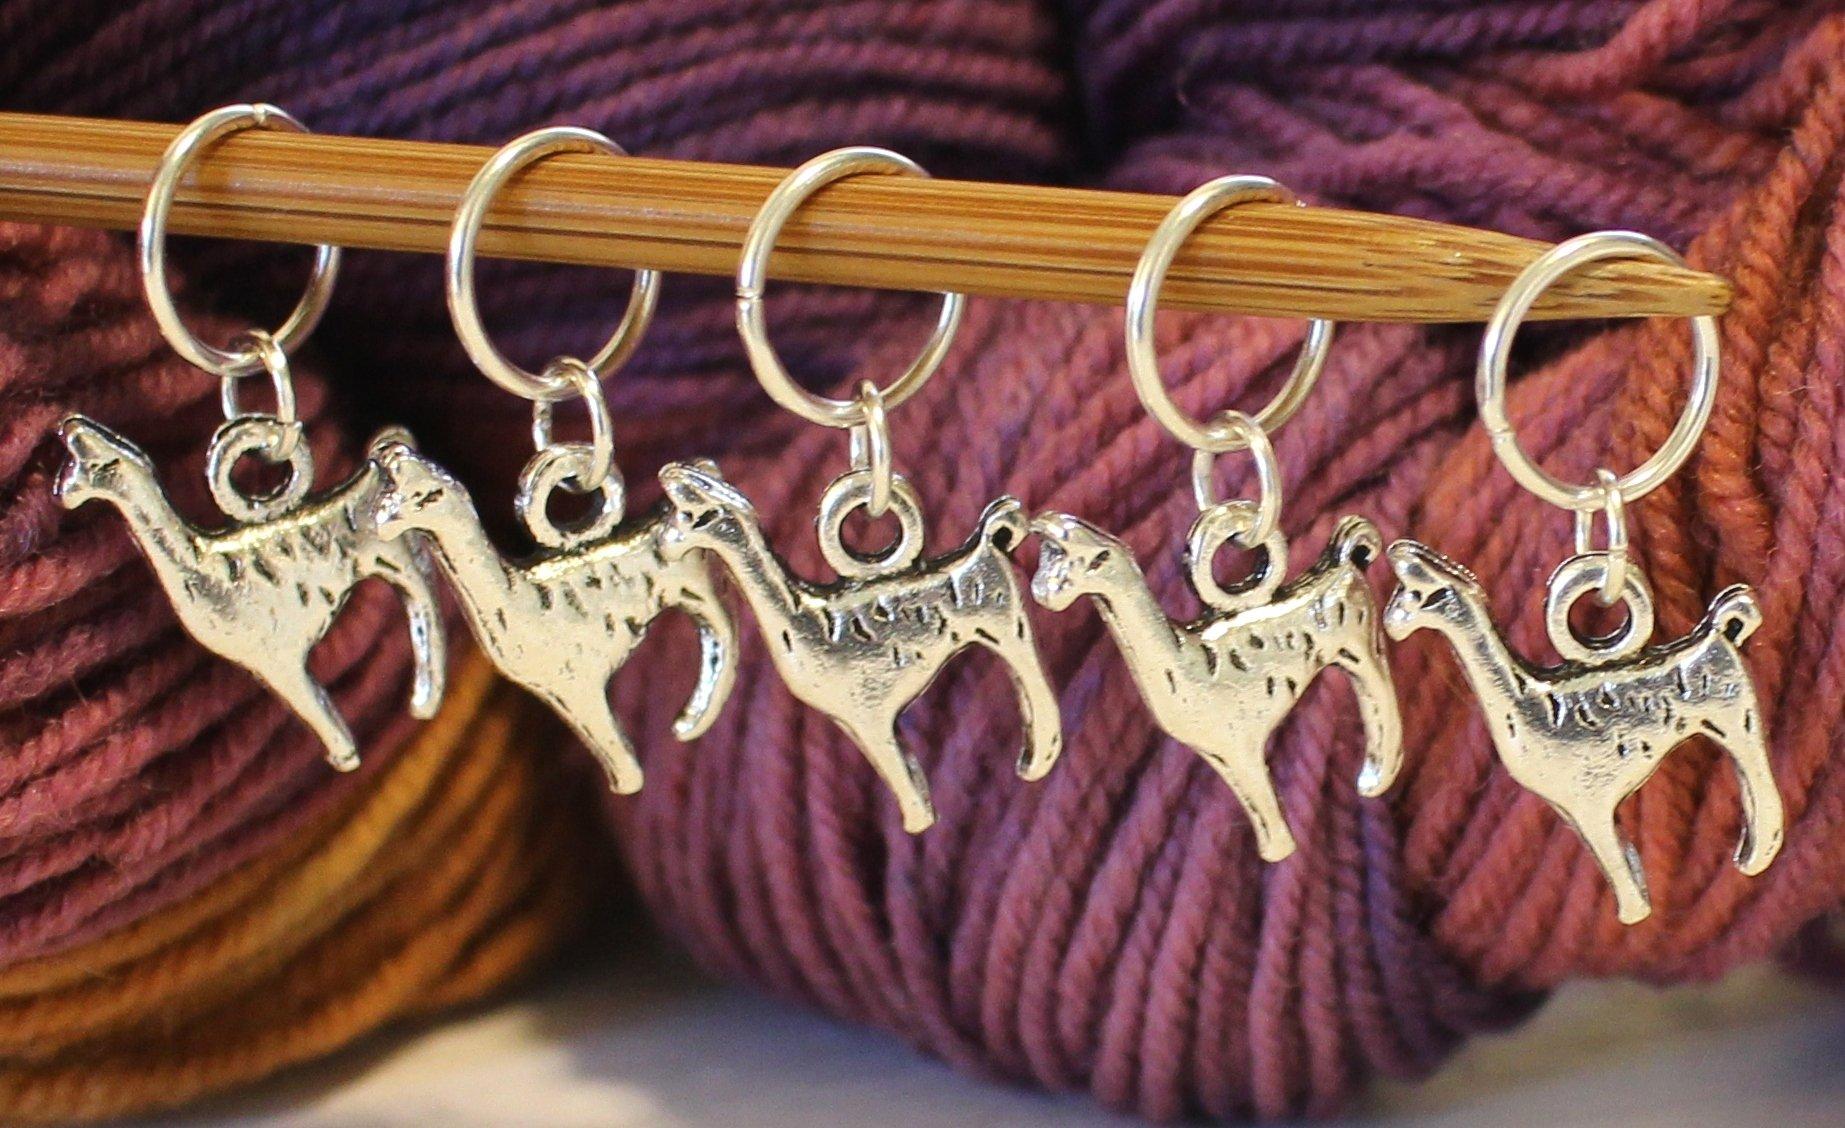 Set of 5 Alpaca Llama Stitch Markers for Knitting Stitchmarker Stitch Marker